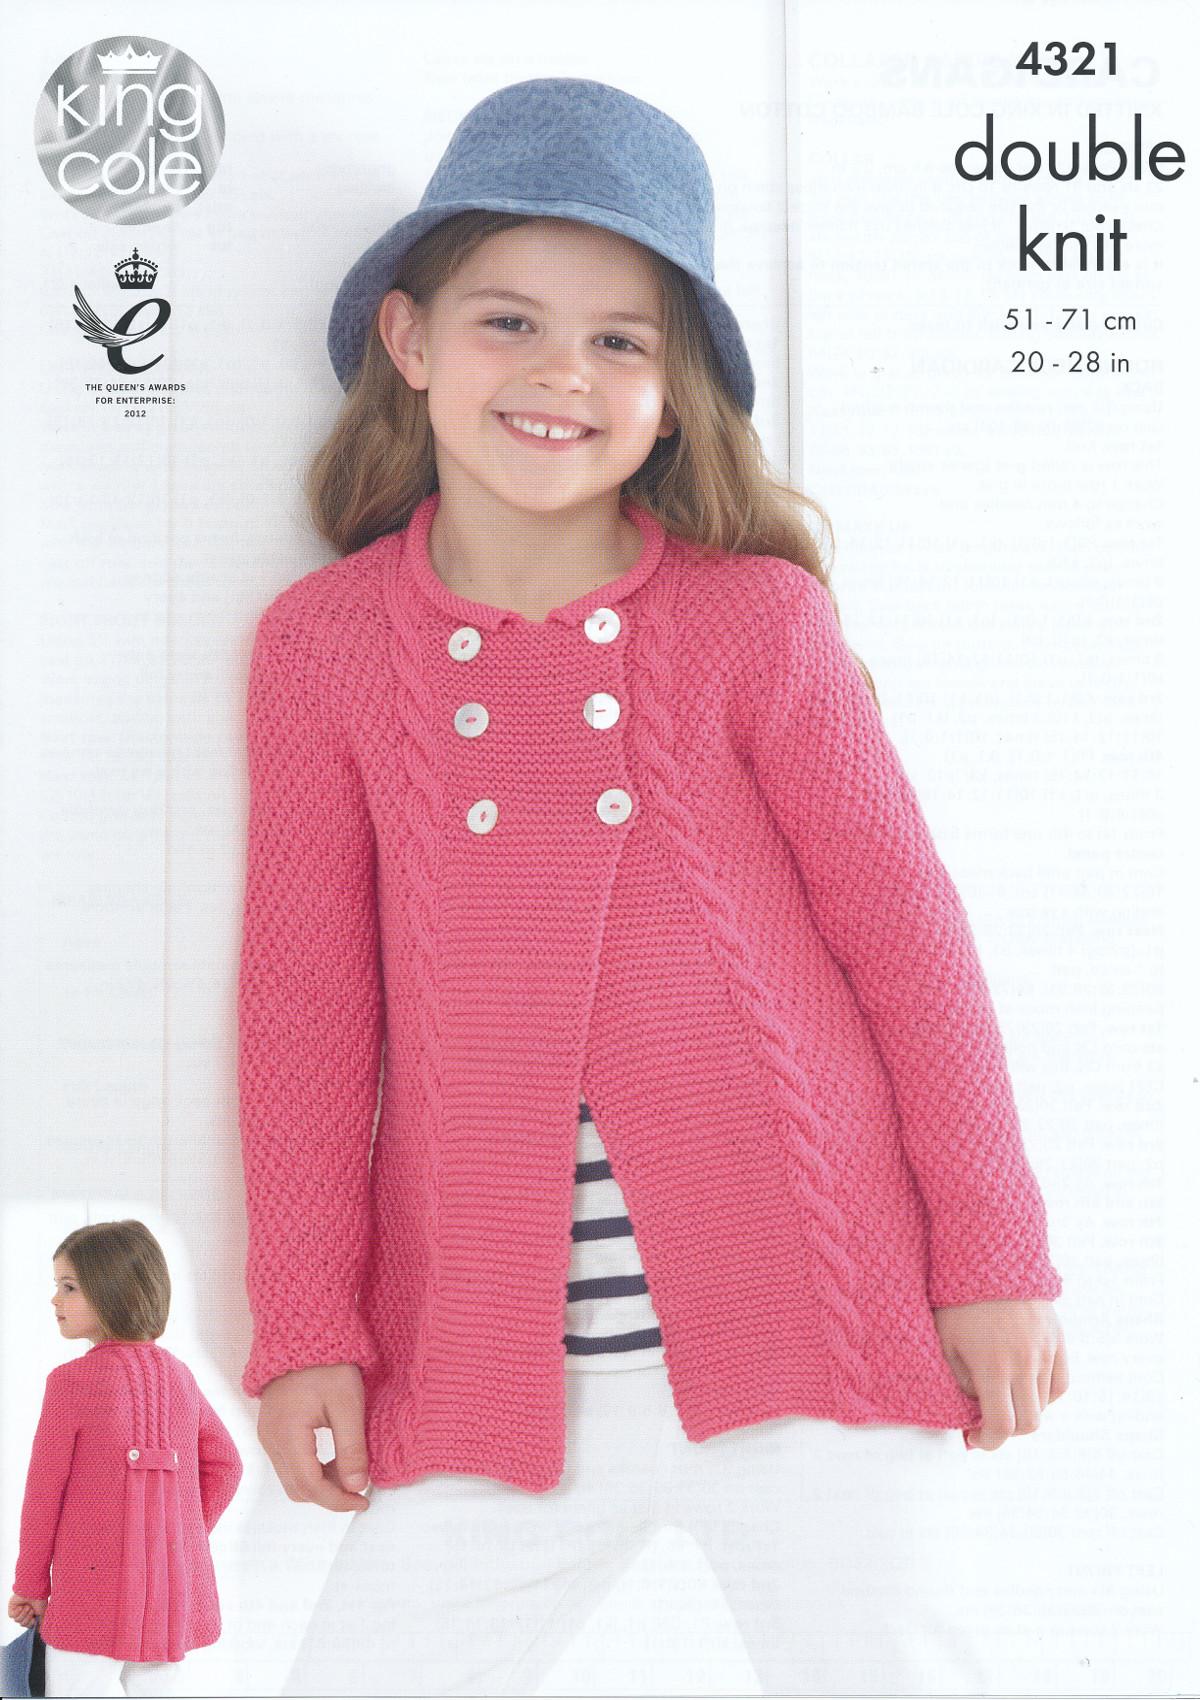 Kids Double Knitting Pattern King Cole Girls Cardigans Bamboo Cotton DK 4321